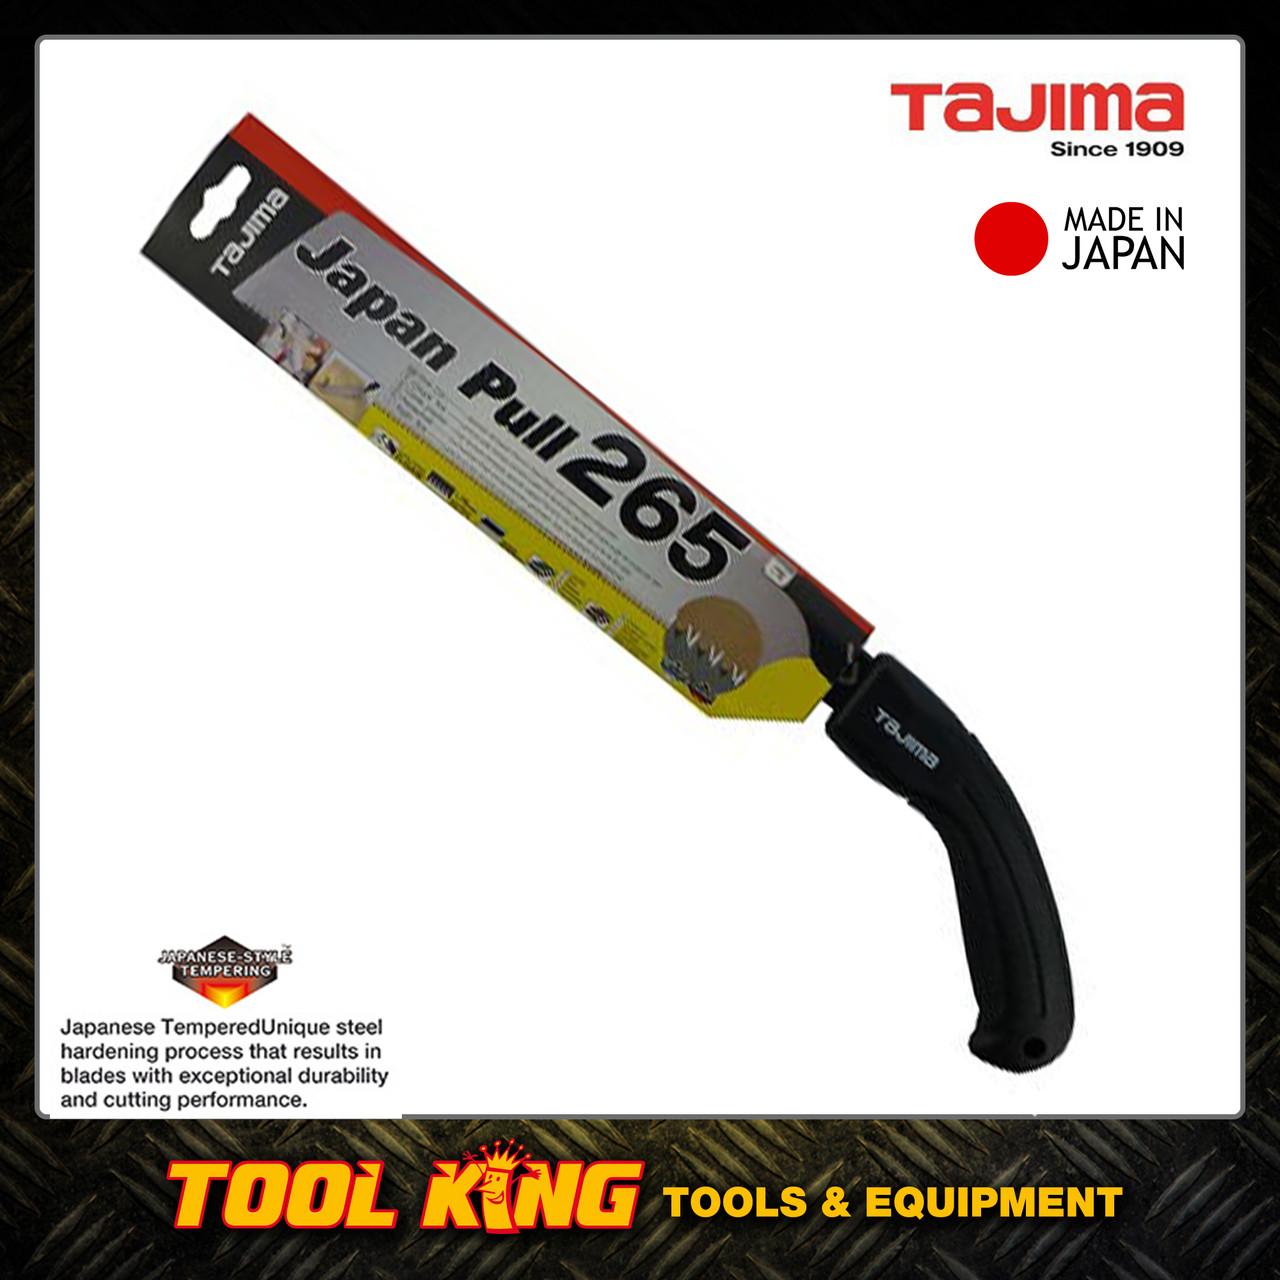 Japanese Pull saw 265 Tajima Made in Japan